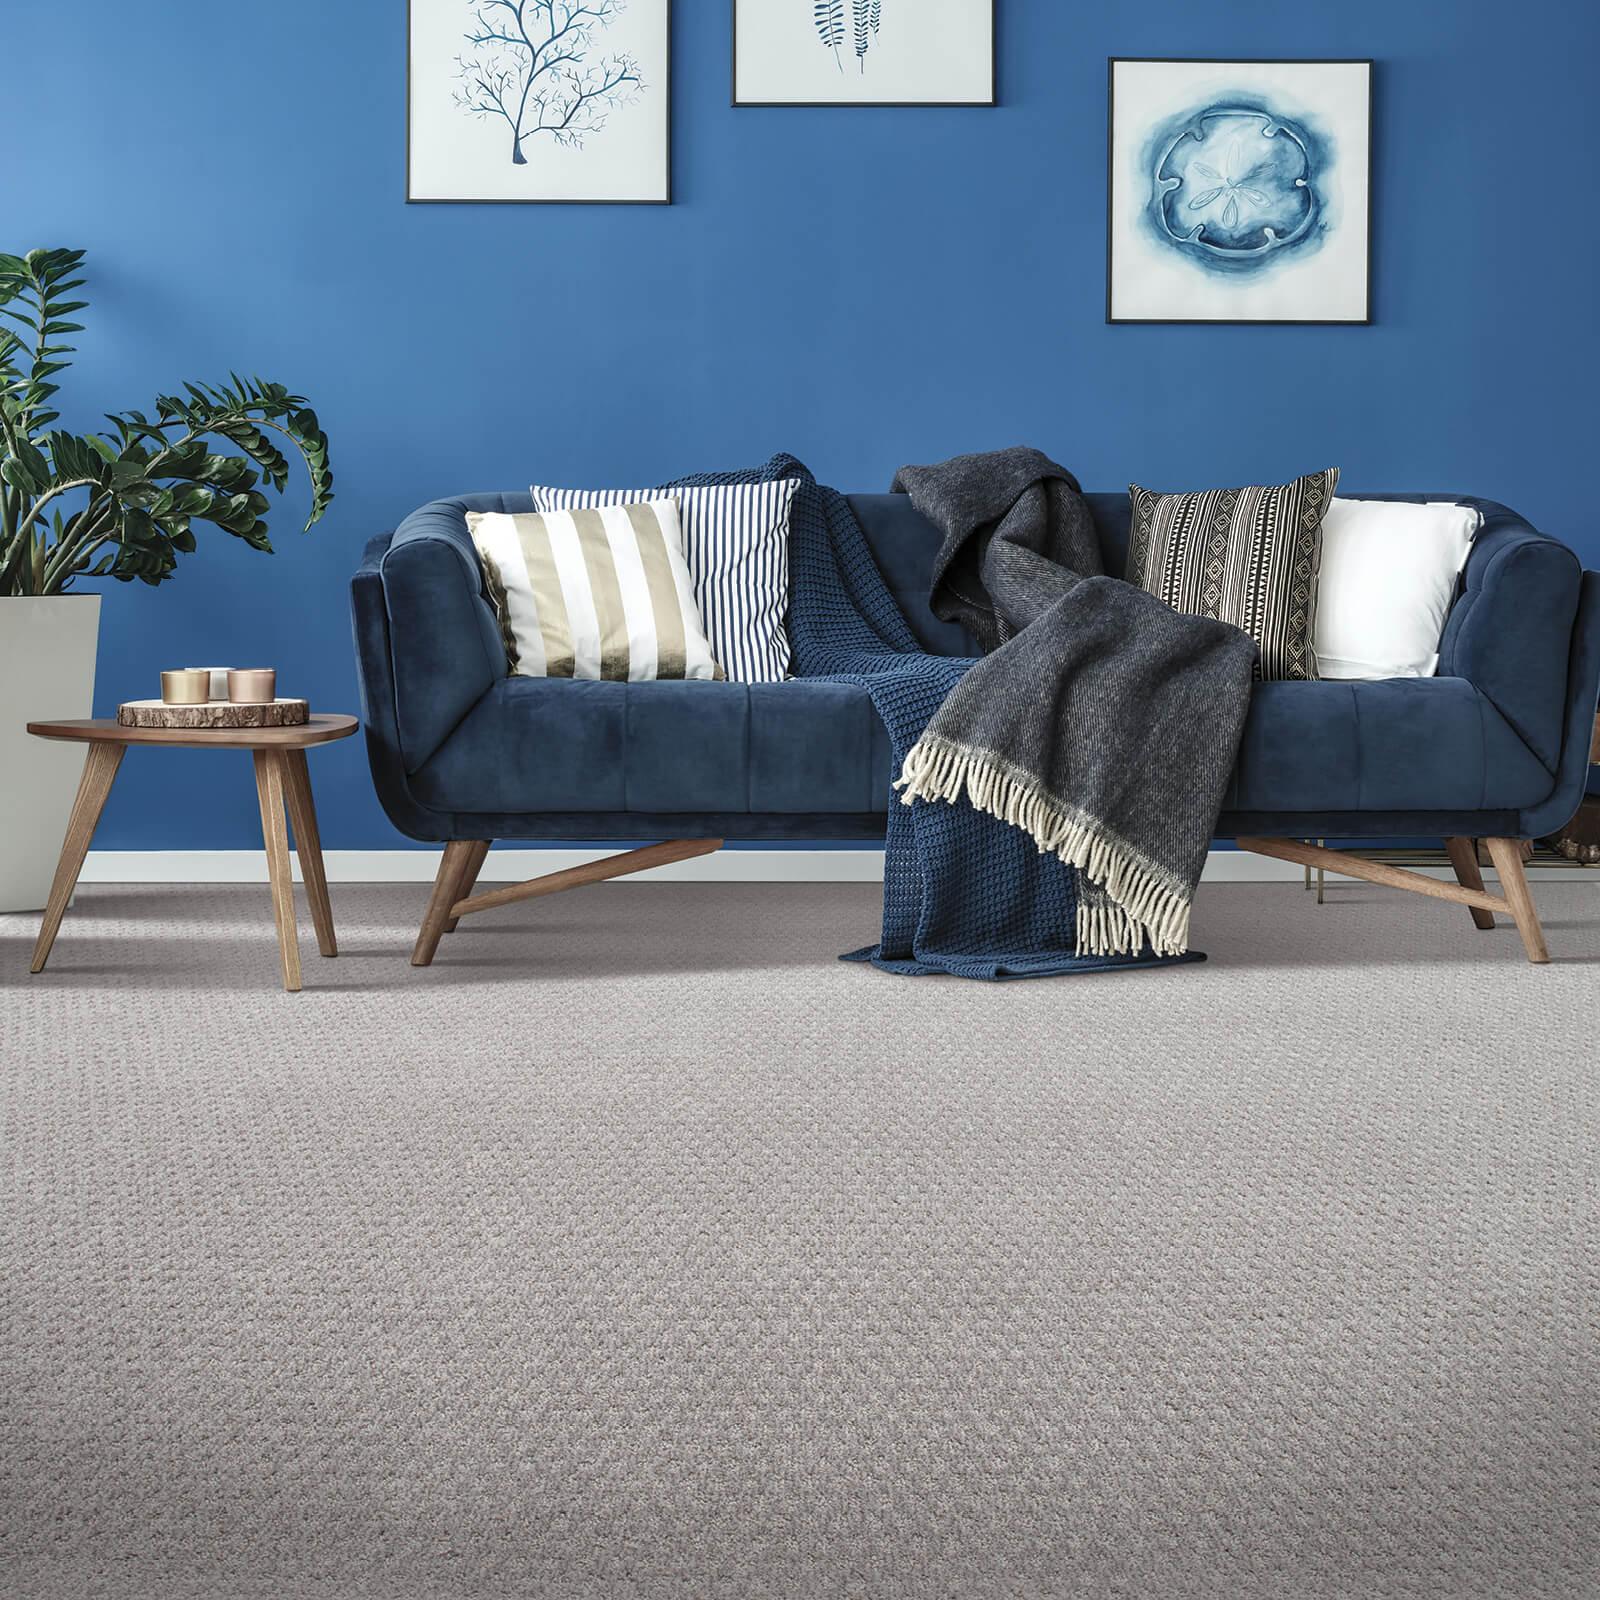 Stylish edge of carpet | McSwain Carpet & Floors